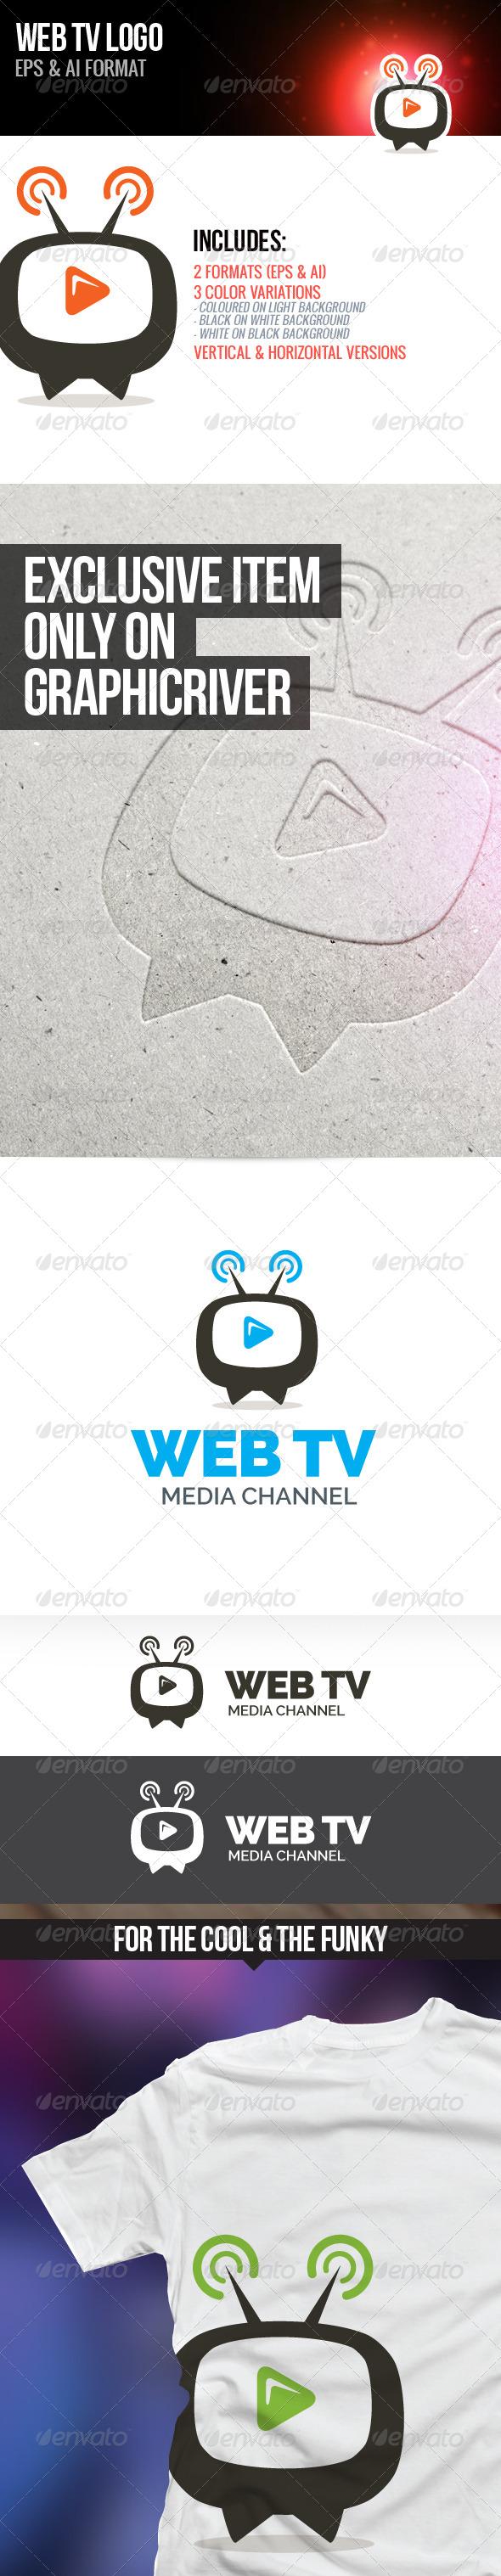 Web TV Logo - Objects Logo Templates